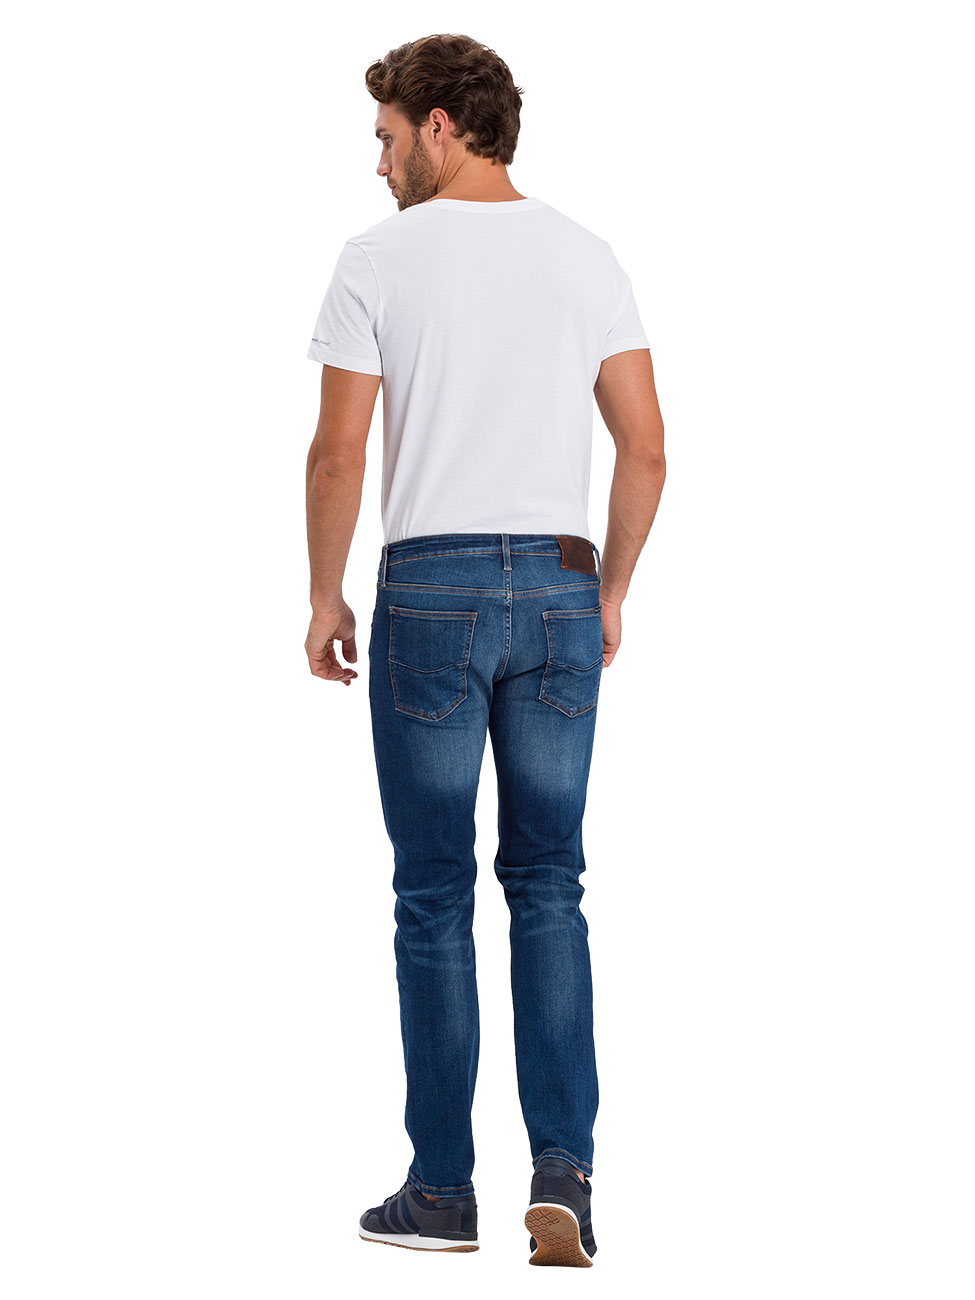 cross-jeans-herren-jeans-damien-slim-fit-blau-mid-blue